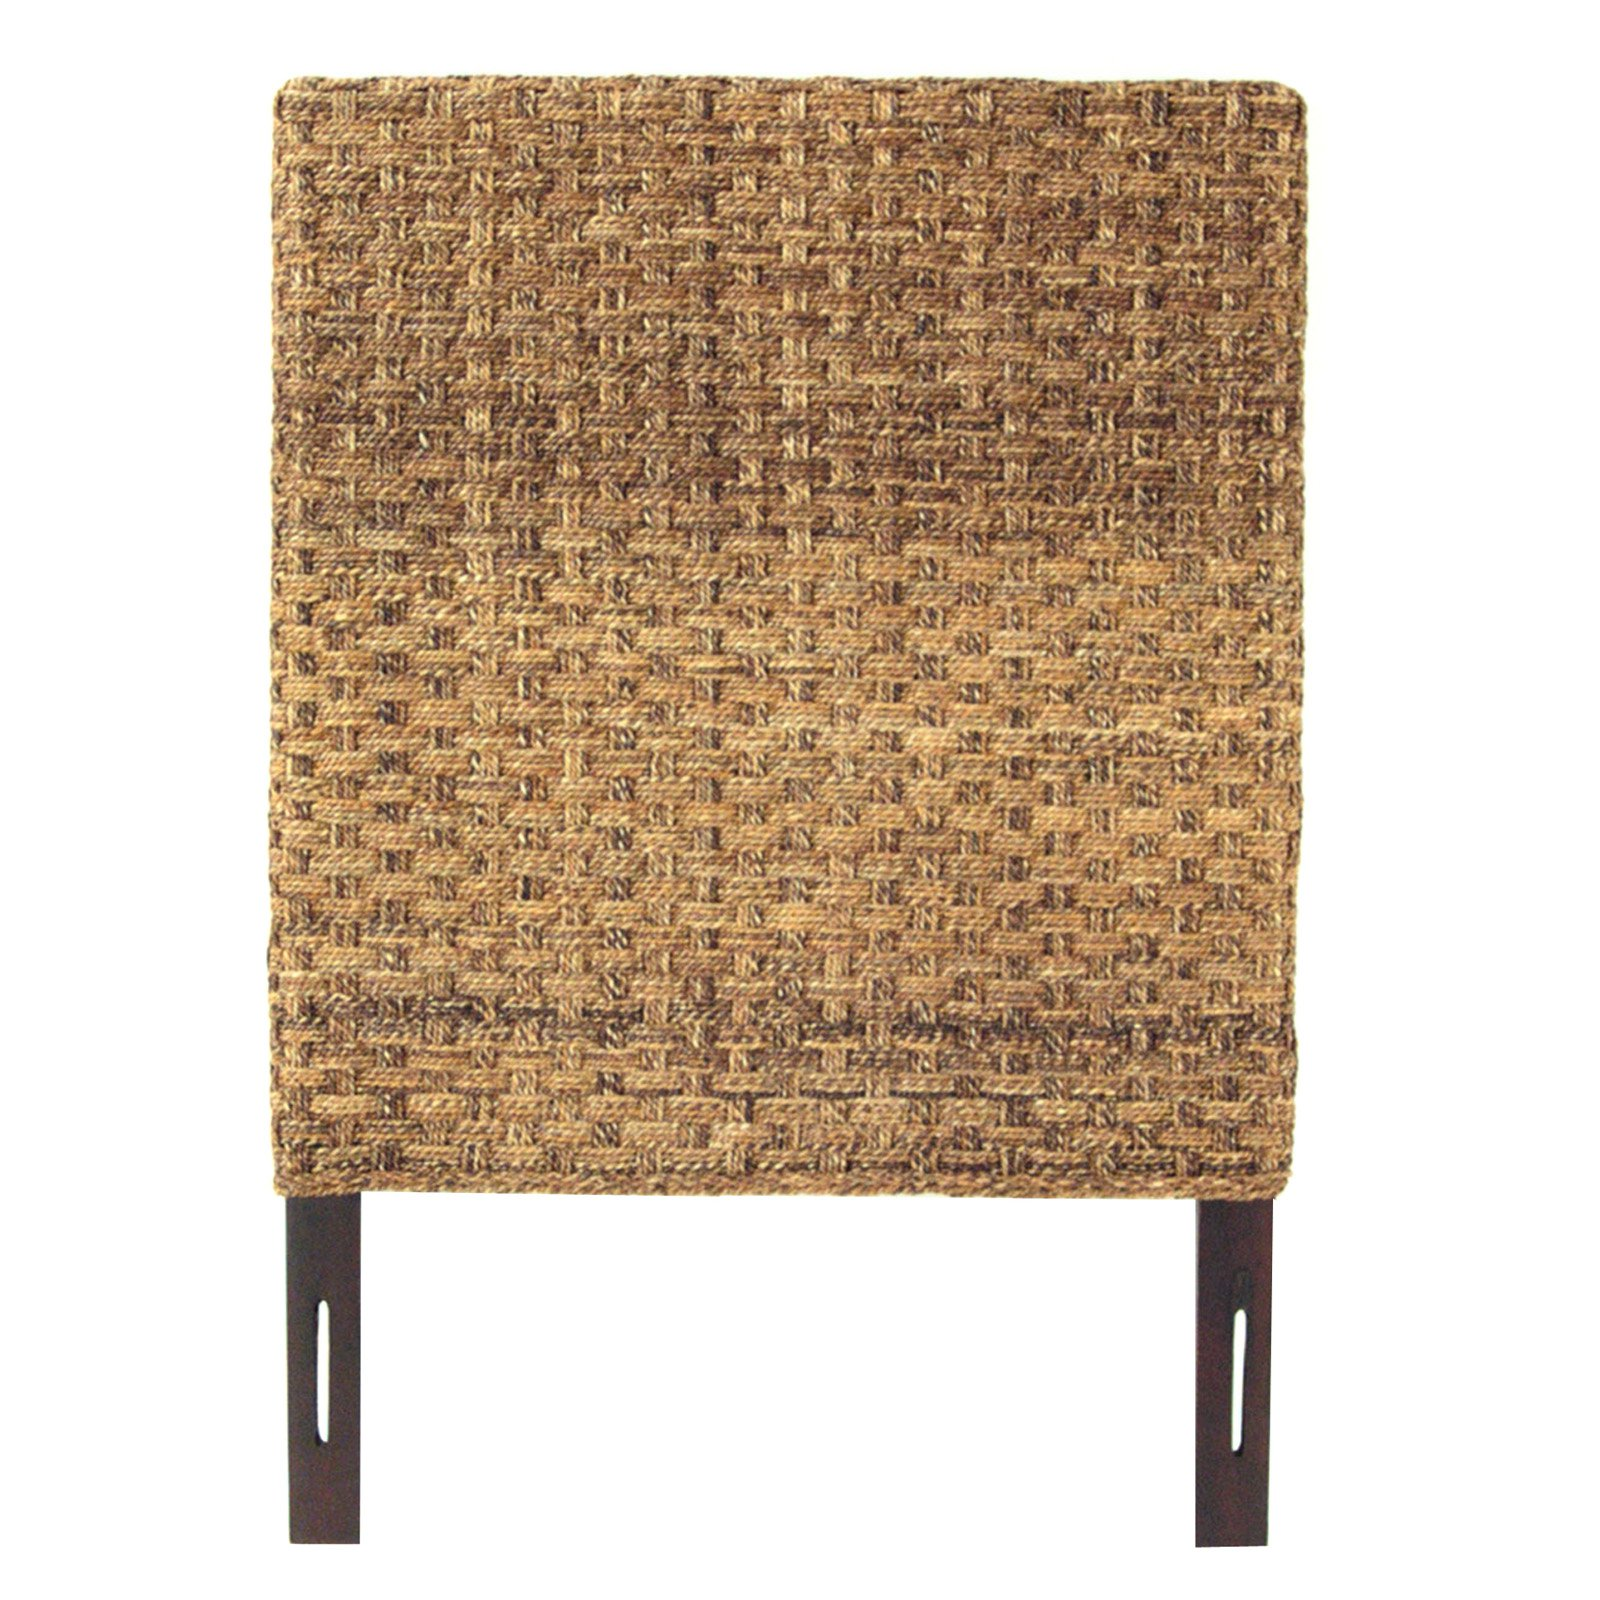 Padmas Plantation Basket Weave Headboard